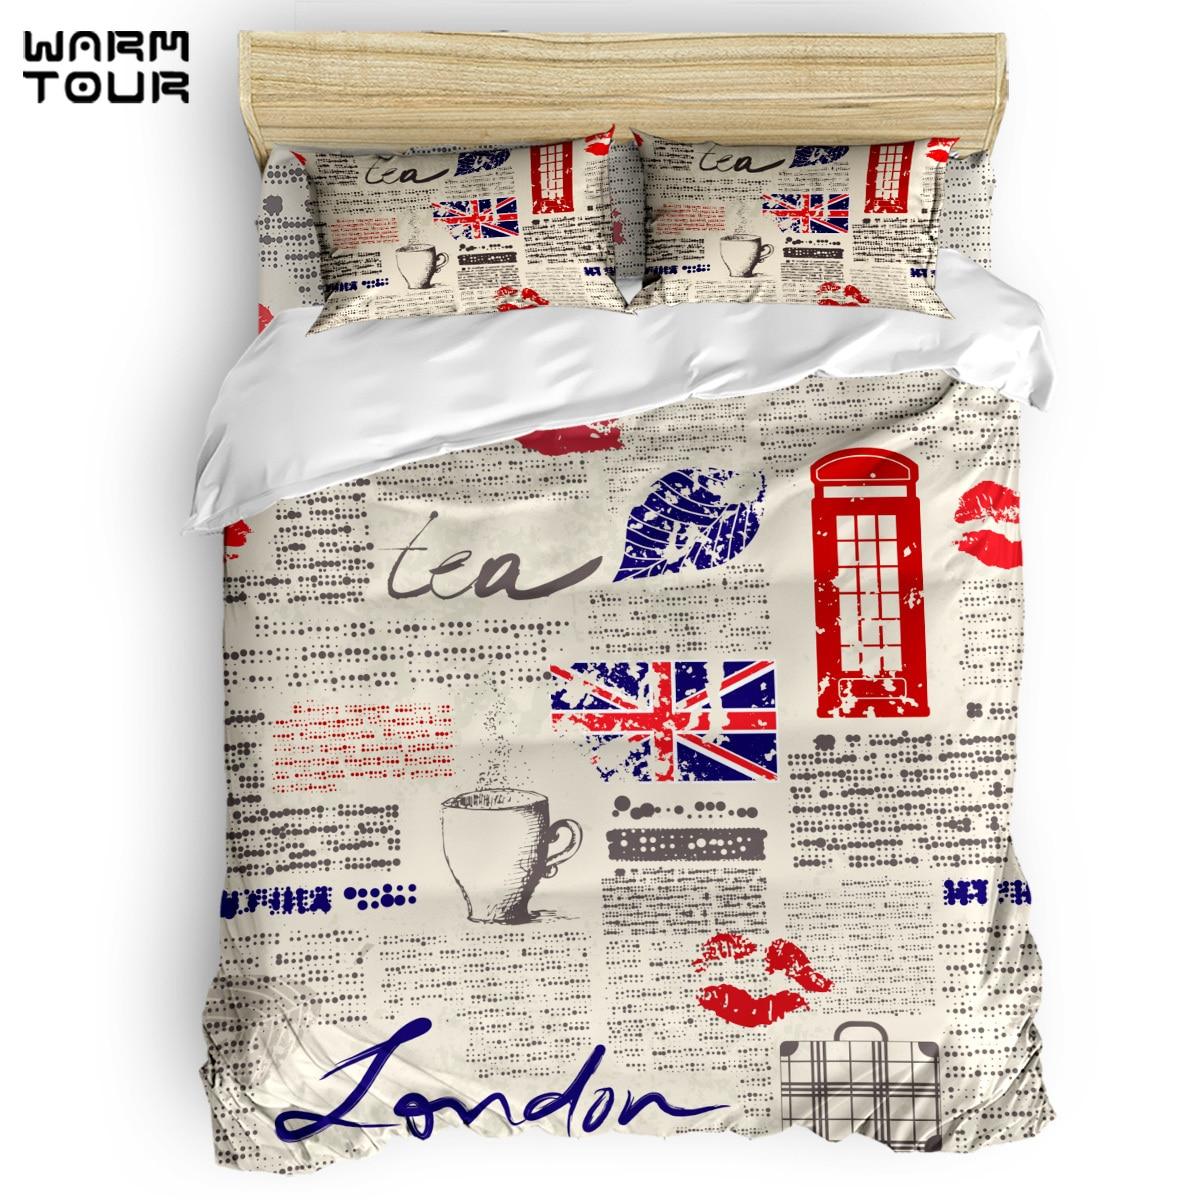 WARMTOUR  Duvet Cover  London Newspaper Duvet Cover Set  4 Piece Bedding Set For Beds DHL Shipping Methods